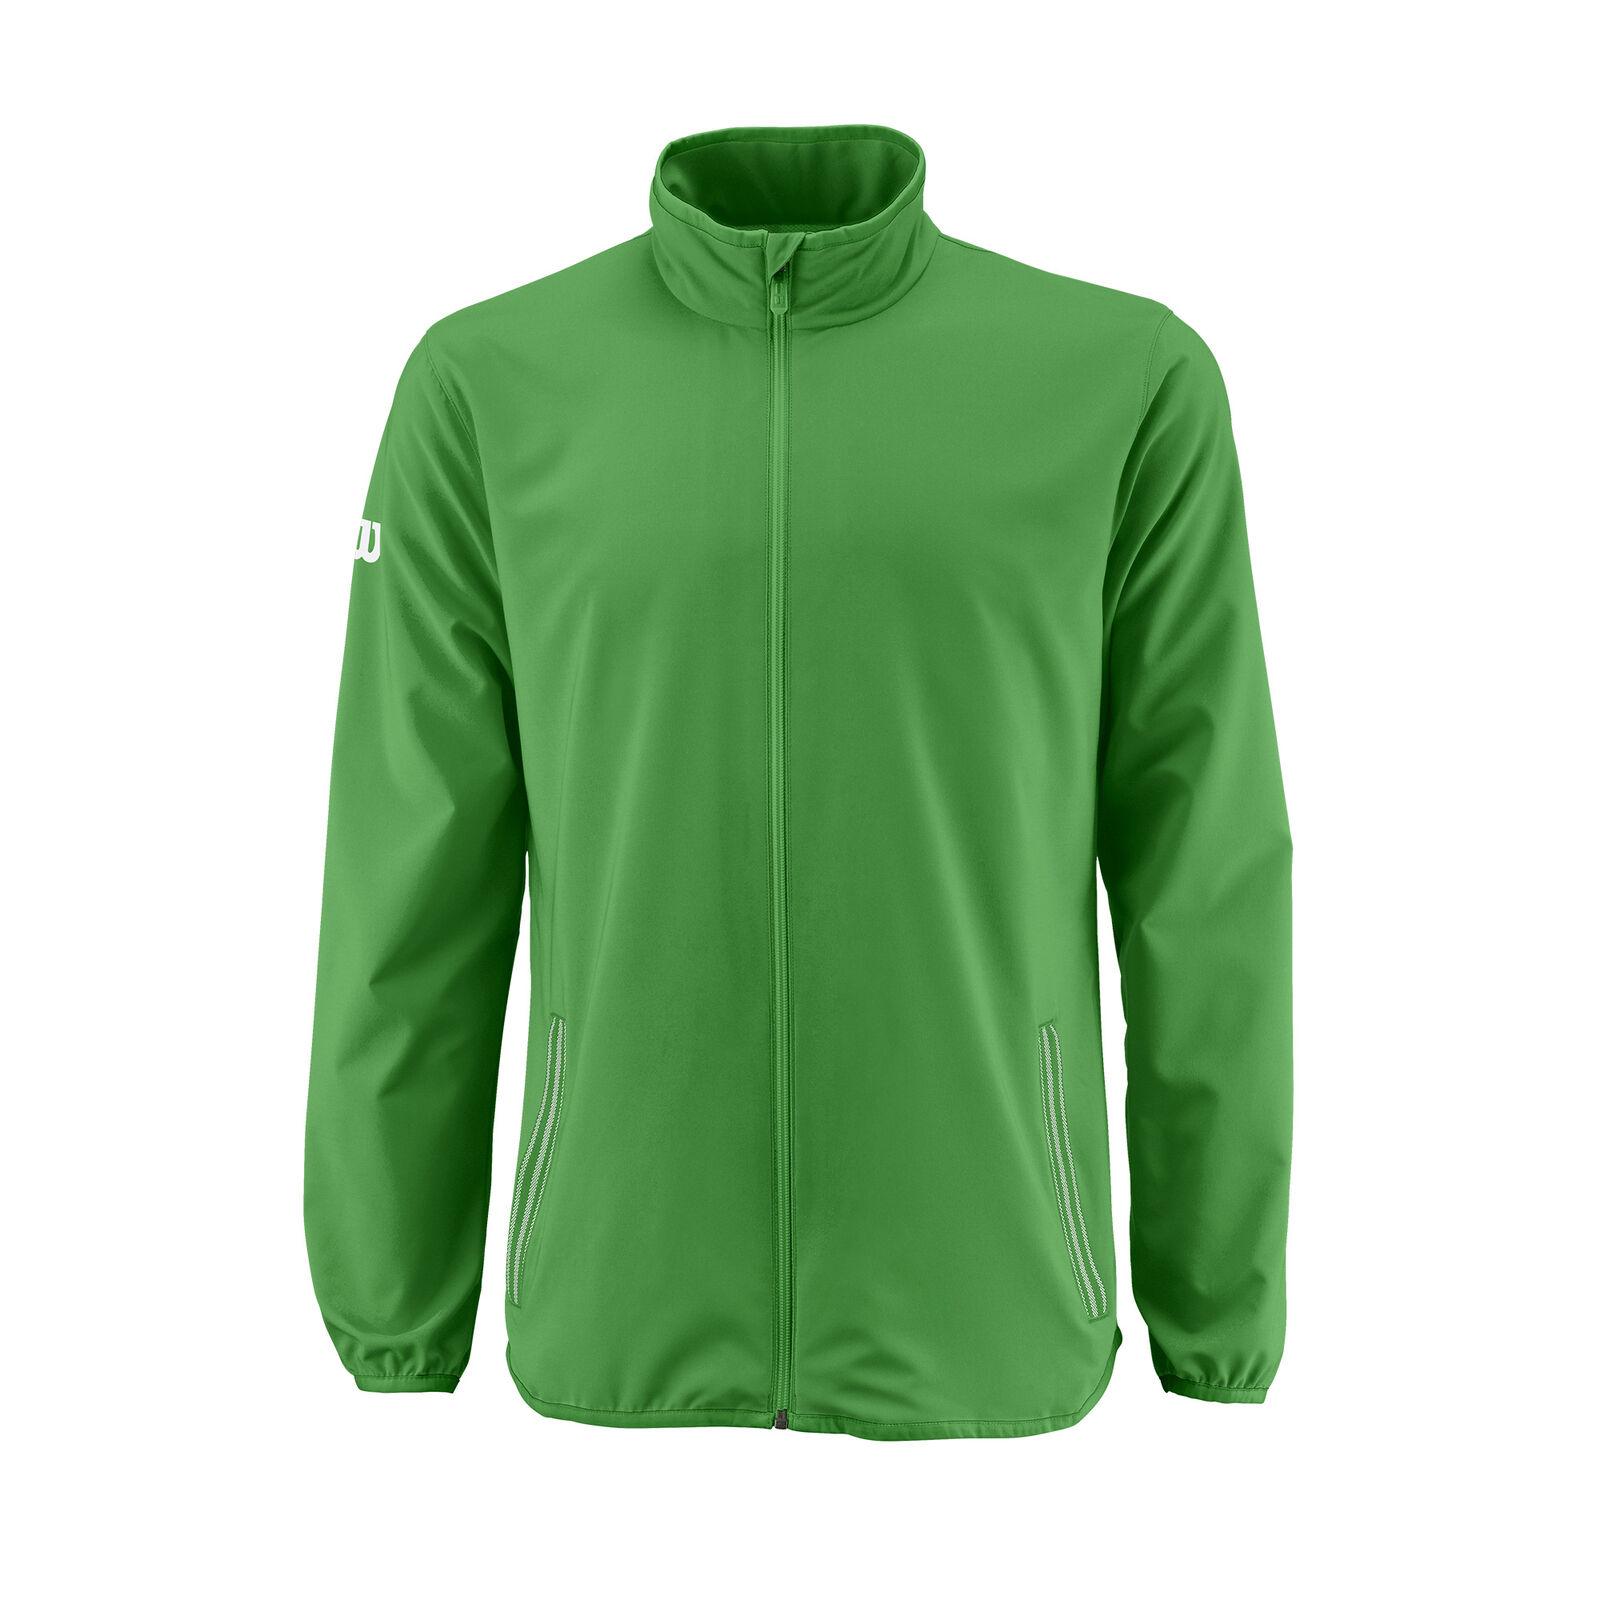 Wilson track Jacket Team Woven Tennis Mens Green